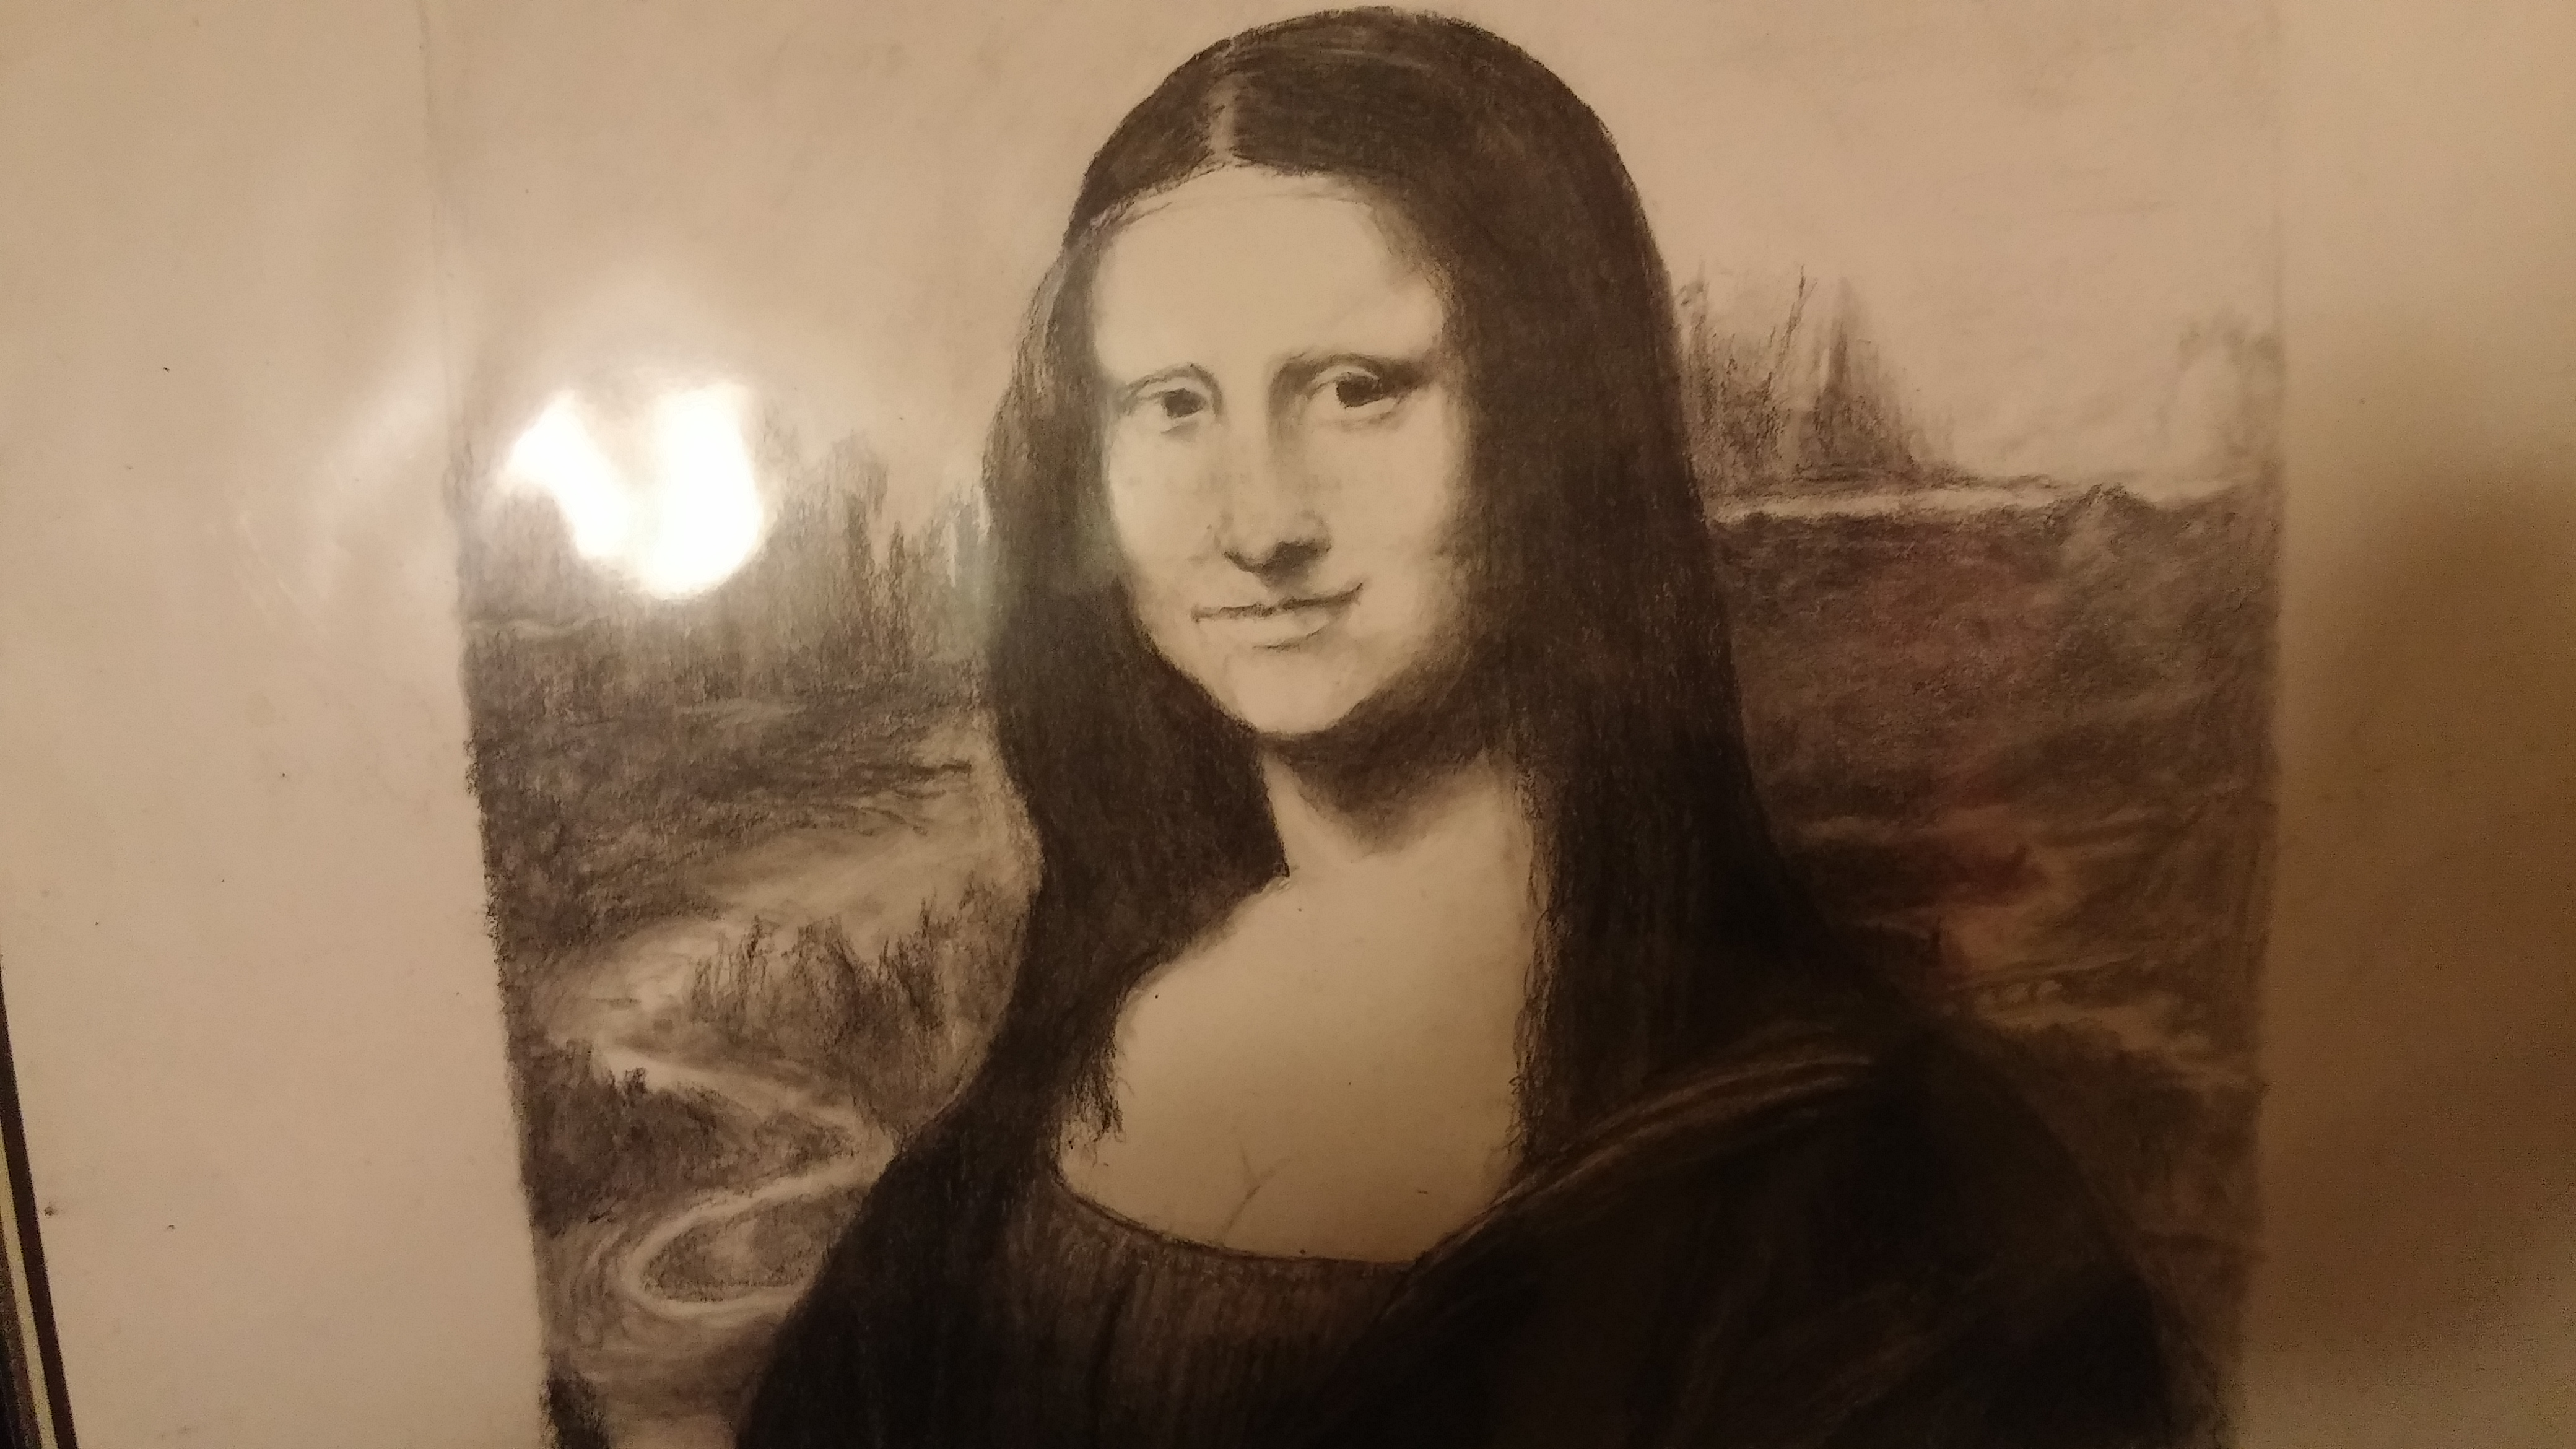 Mona Lisa in charcoal